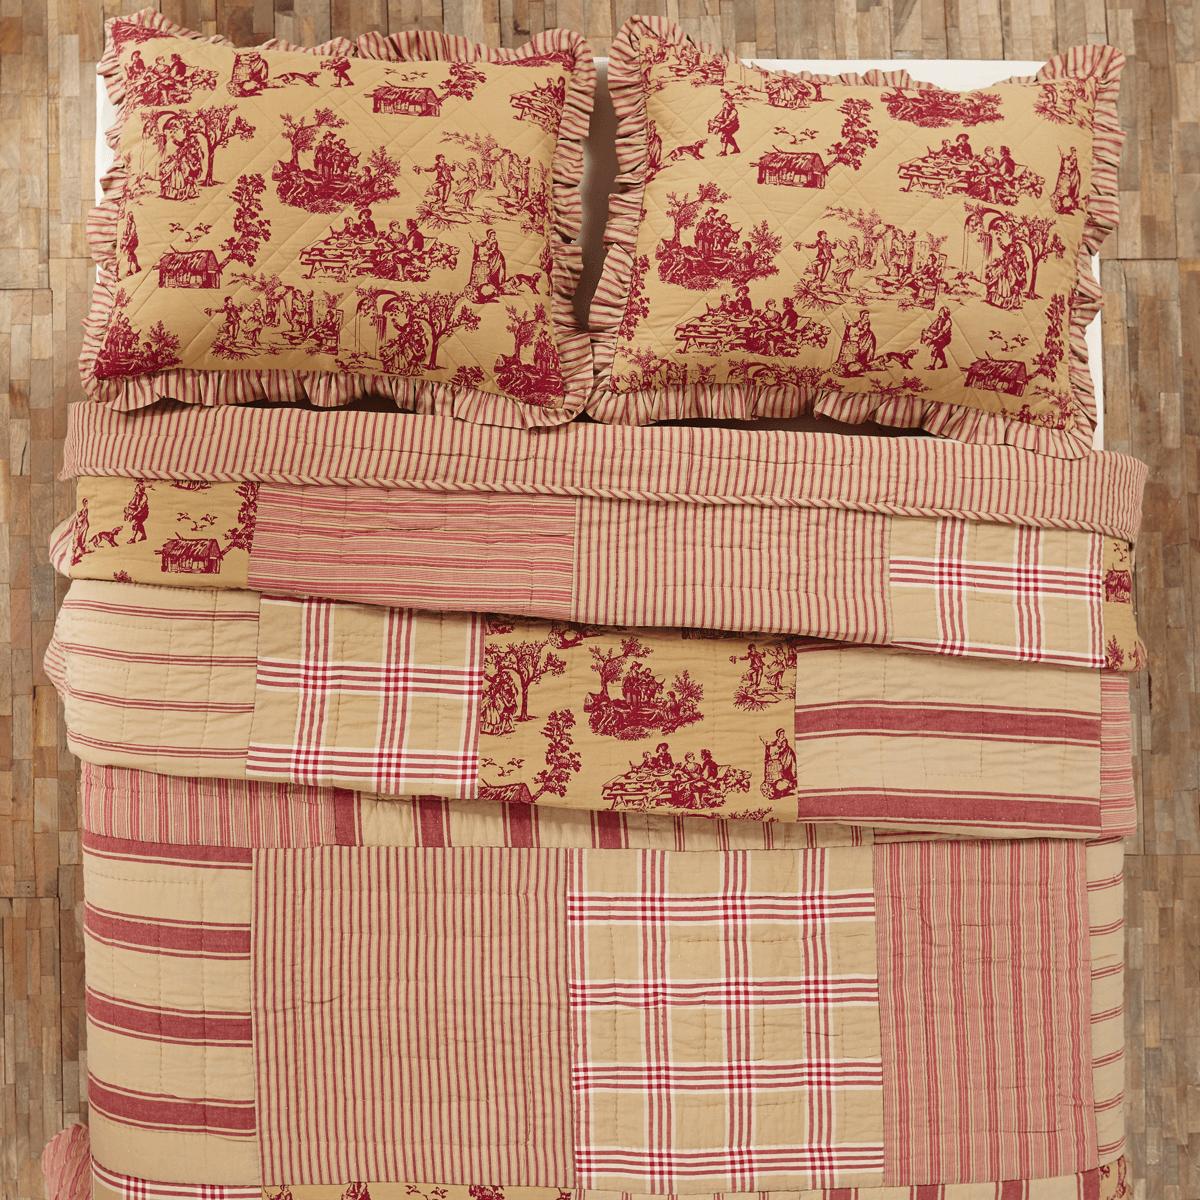 red linens linear range duvet bedding quilt cover floral set product